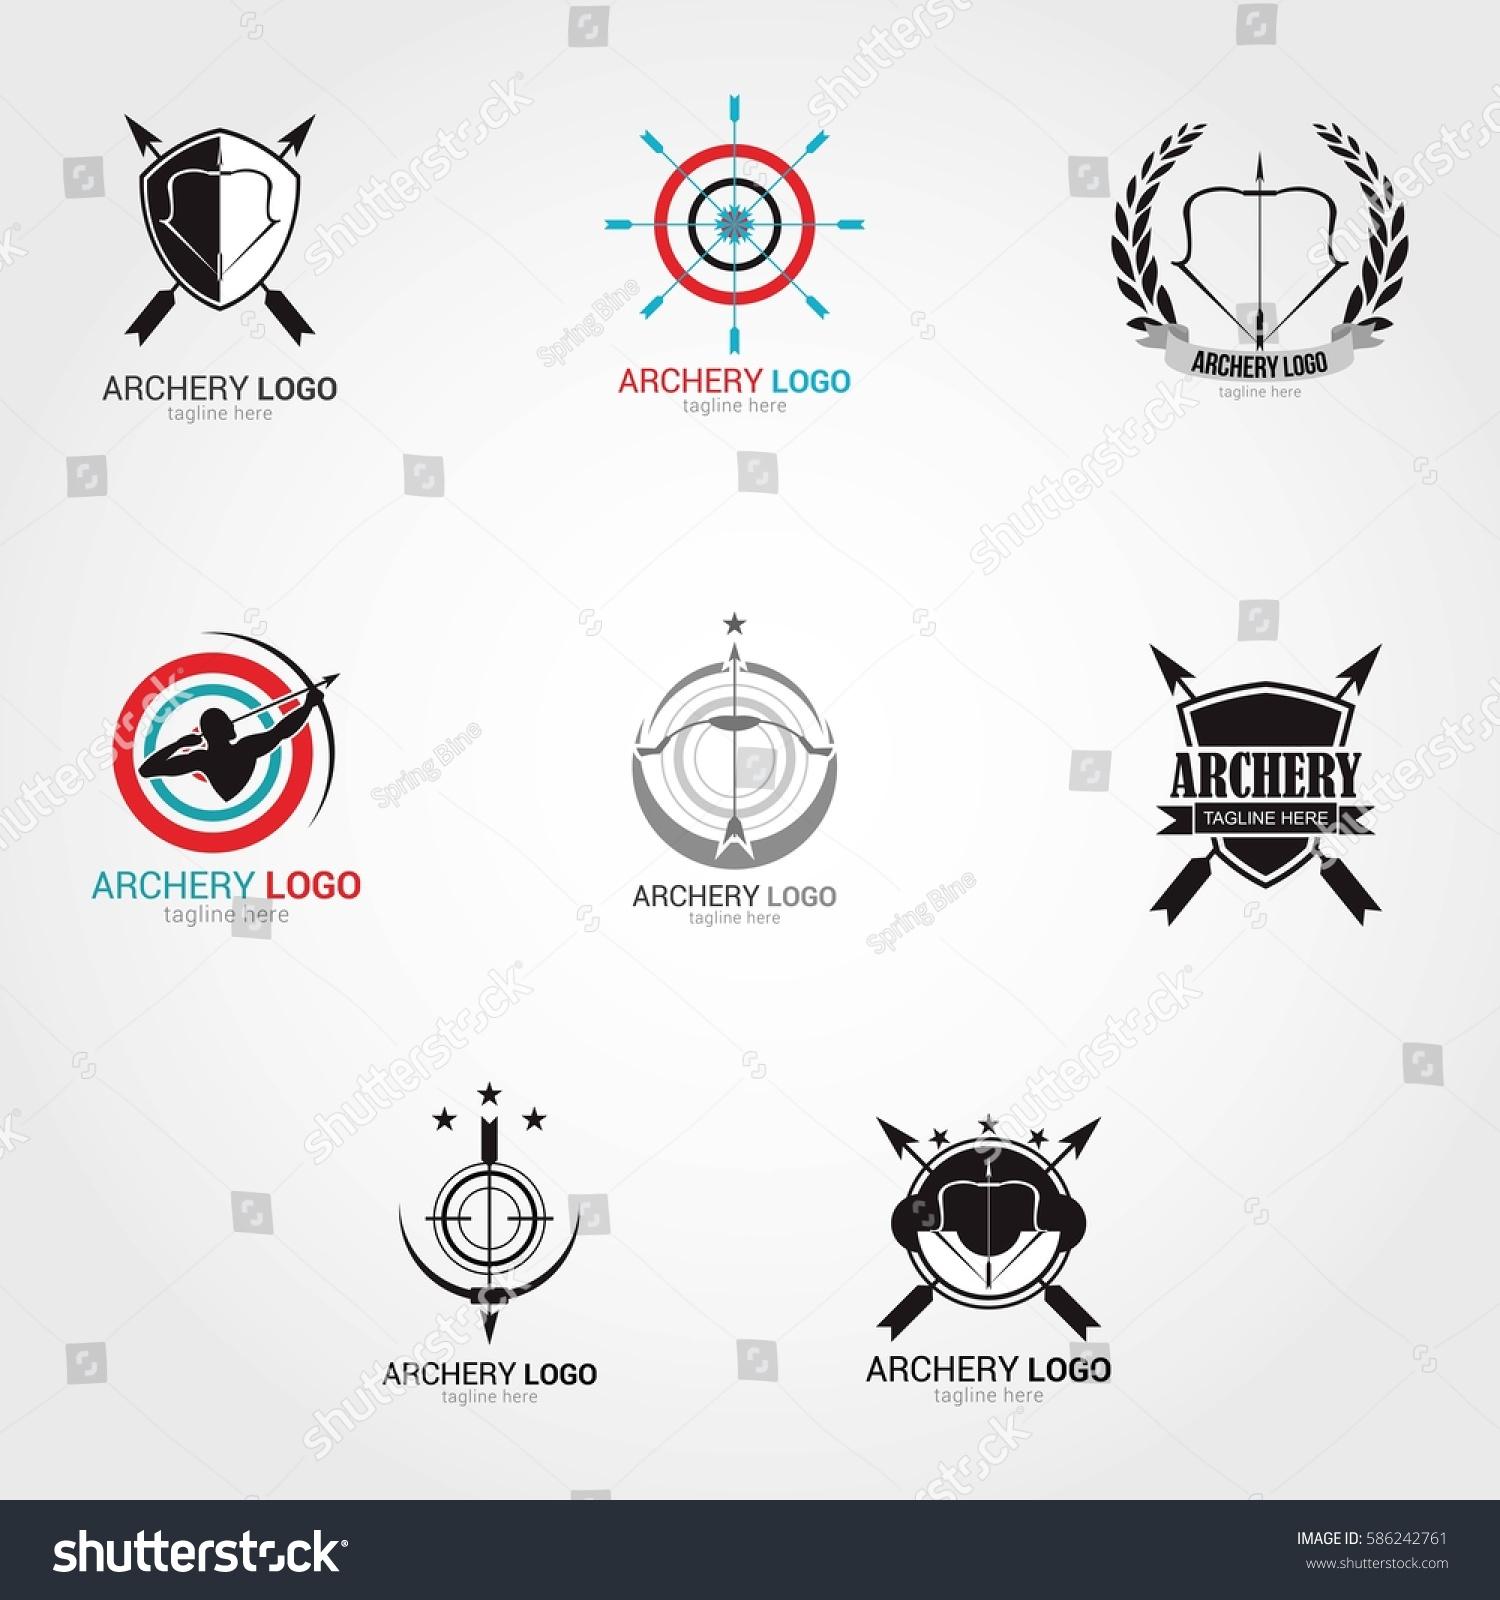 Archery World  Archery World